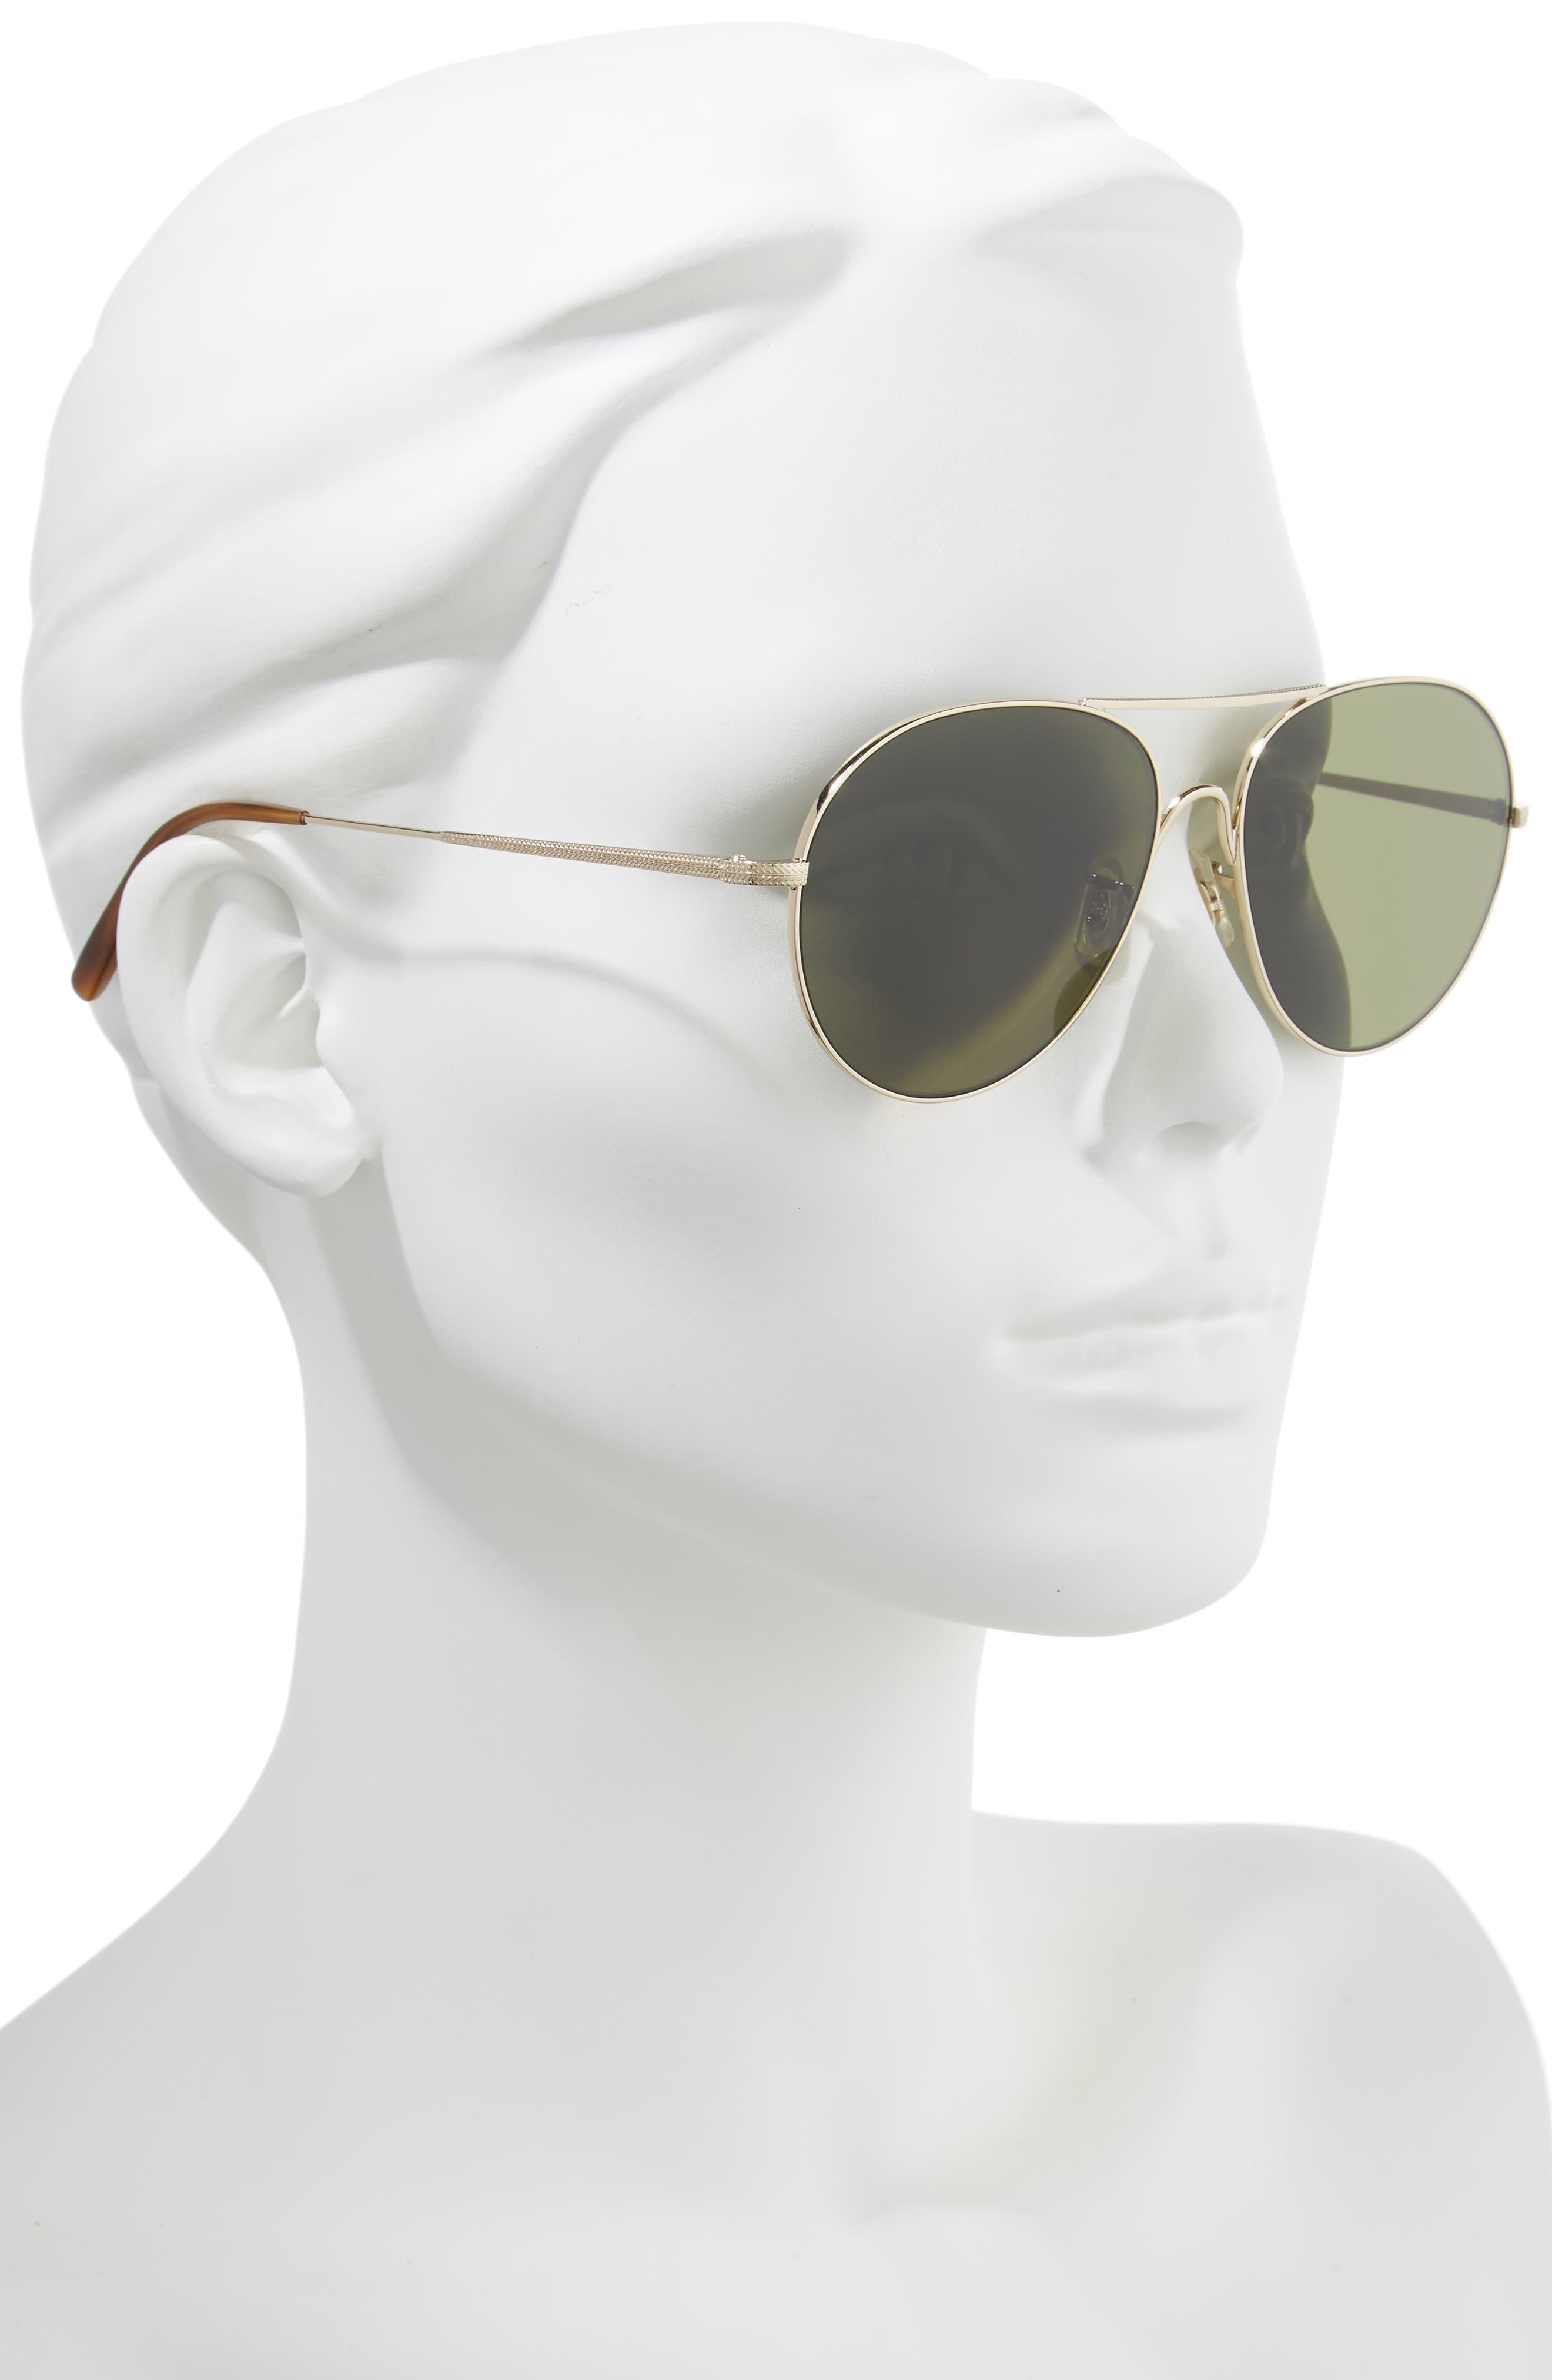 Rockmore 58mm Aviator Sunglasses,                             Alternate thumbnail 2, color,                             GOLD